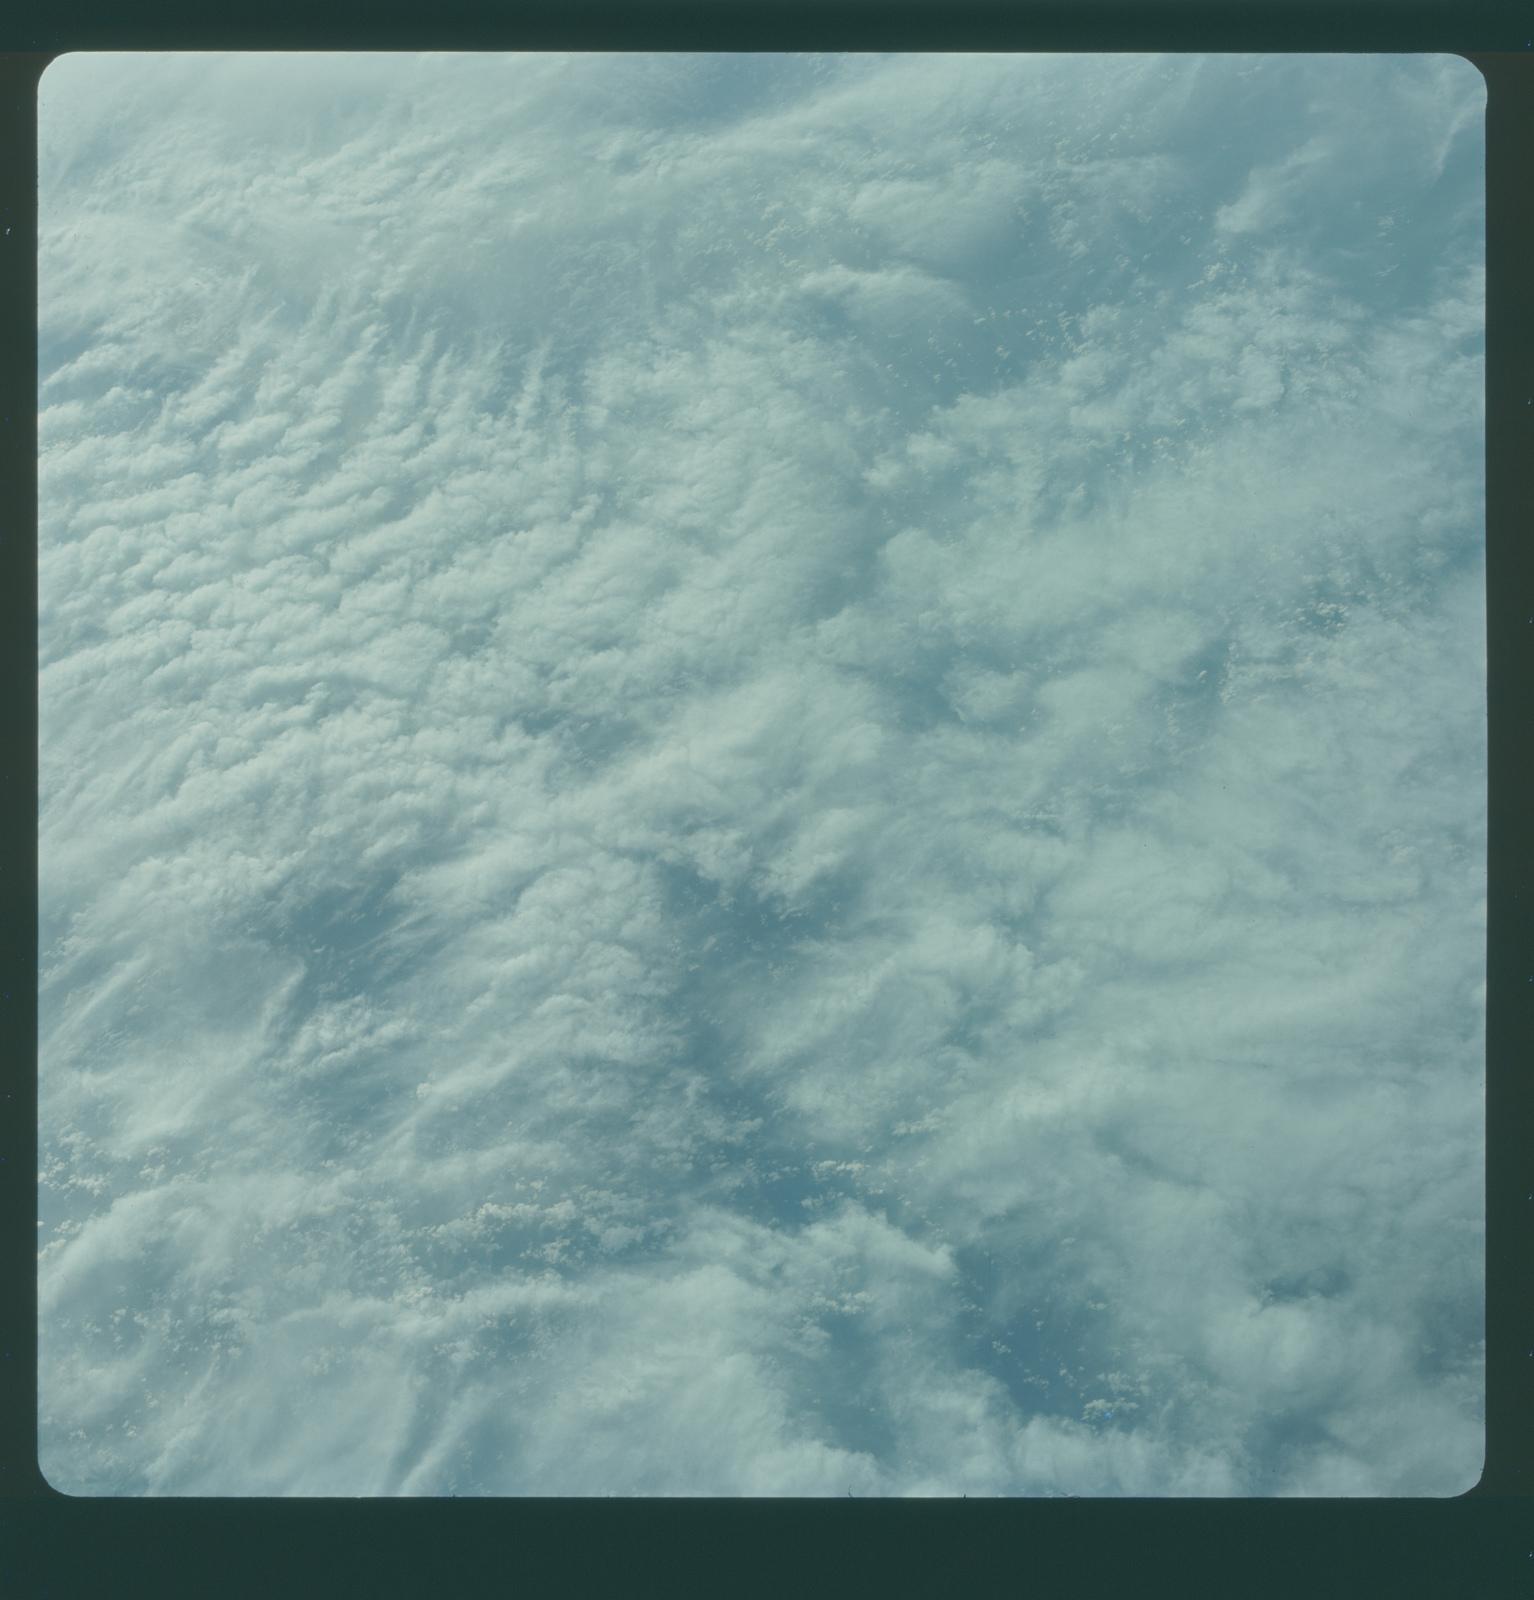 Gemini IV Mission Image - Clouds